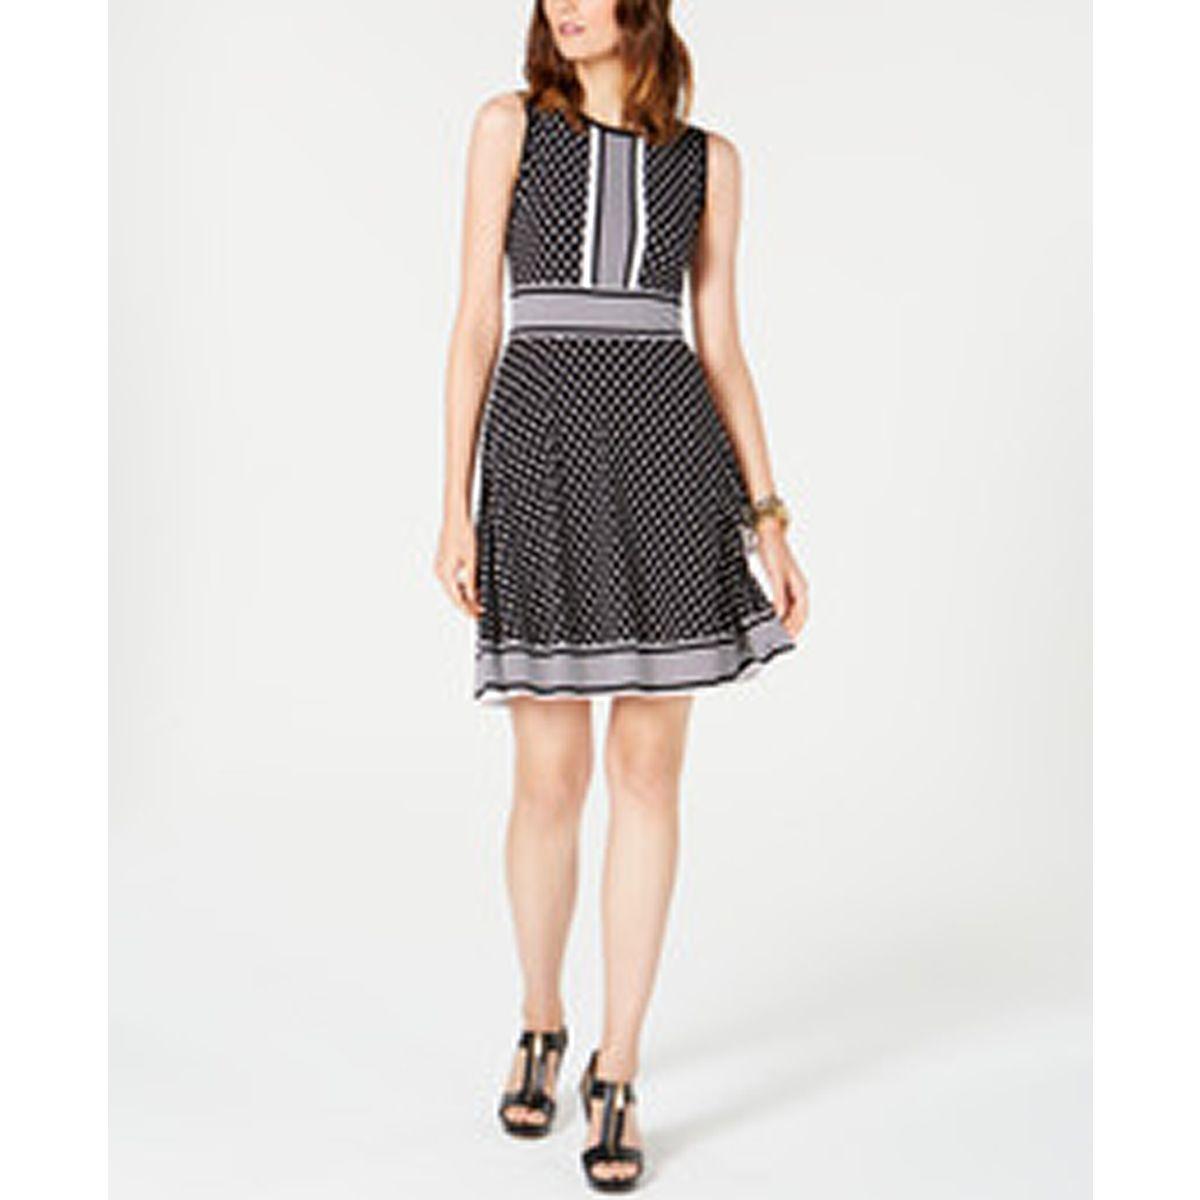 59386cf2640a0 MICHAEL Michael Kors Clothing for Women - Macy's